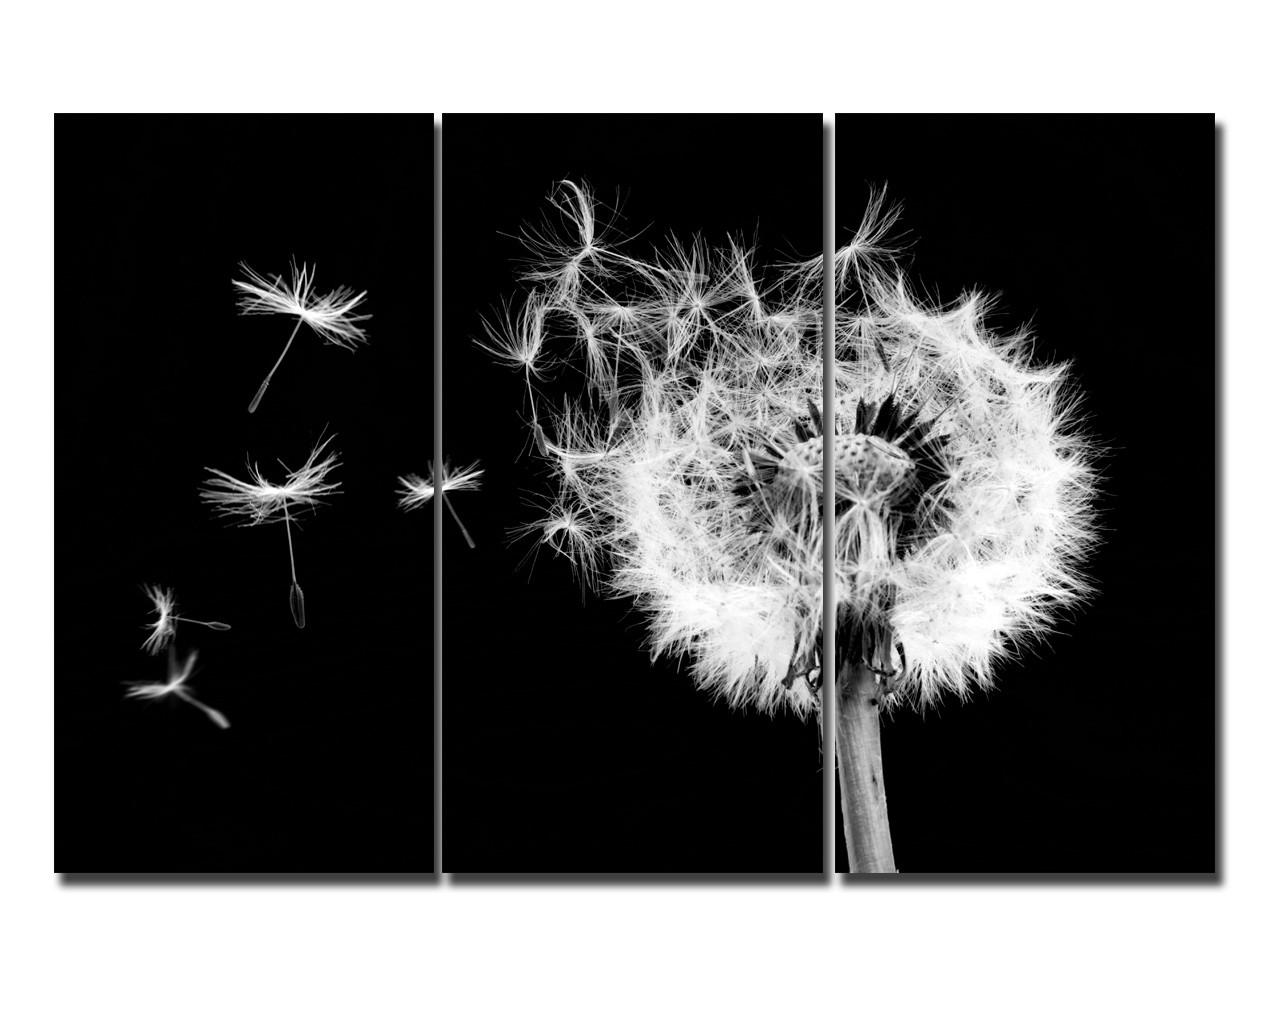 leinwandbild pusteblume schwarz wei triptychon. Black Bedroom Furniture Sets. Home Design Ideas